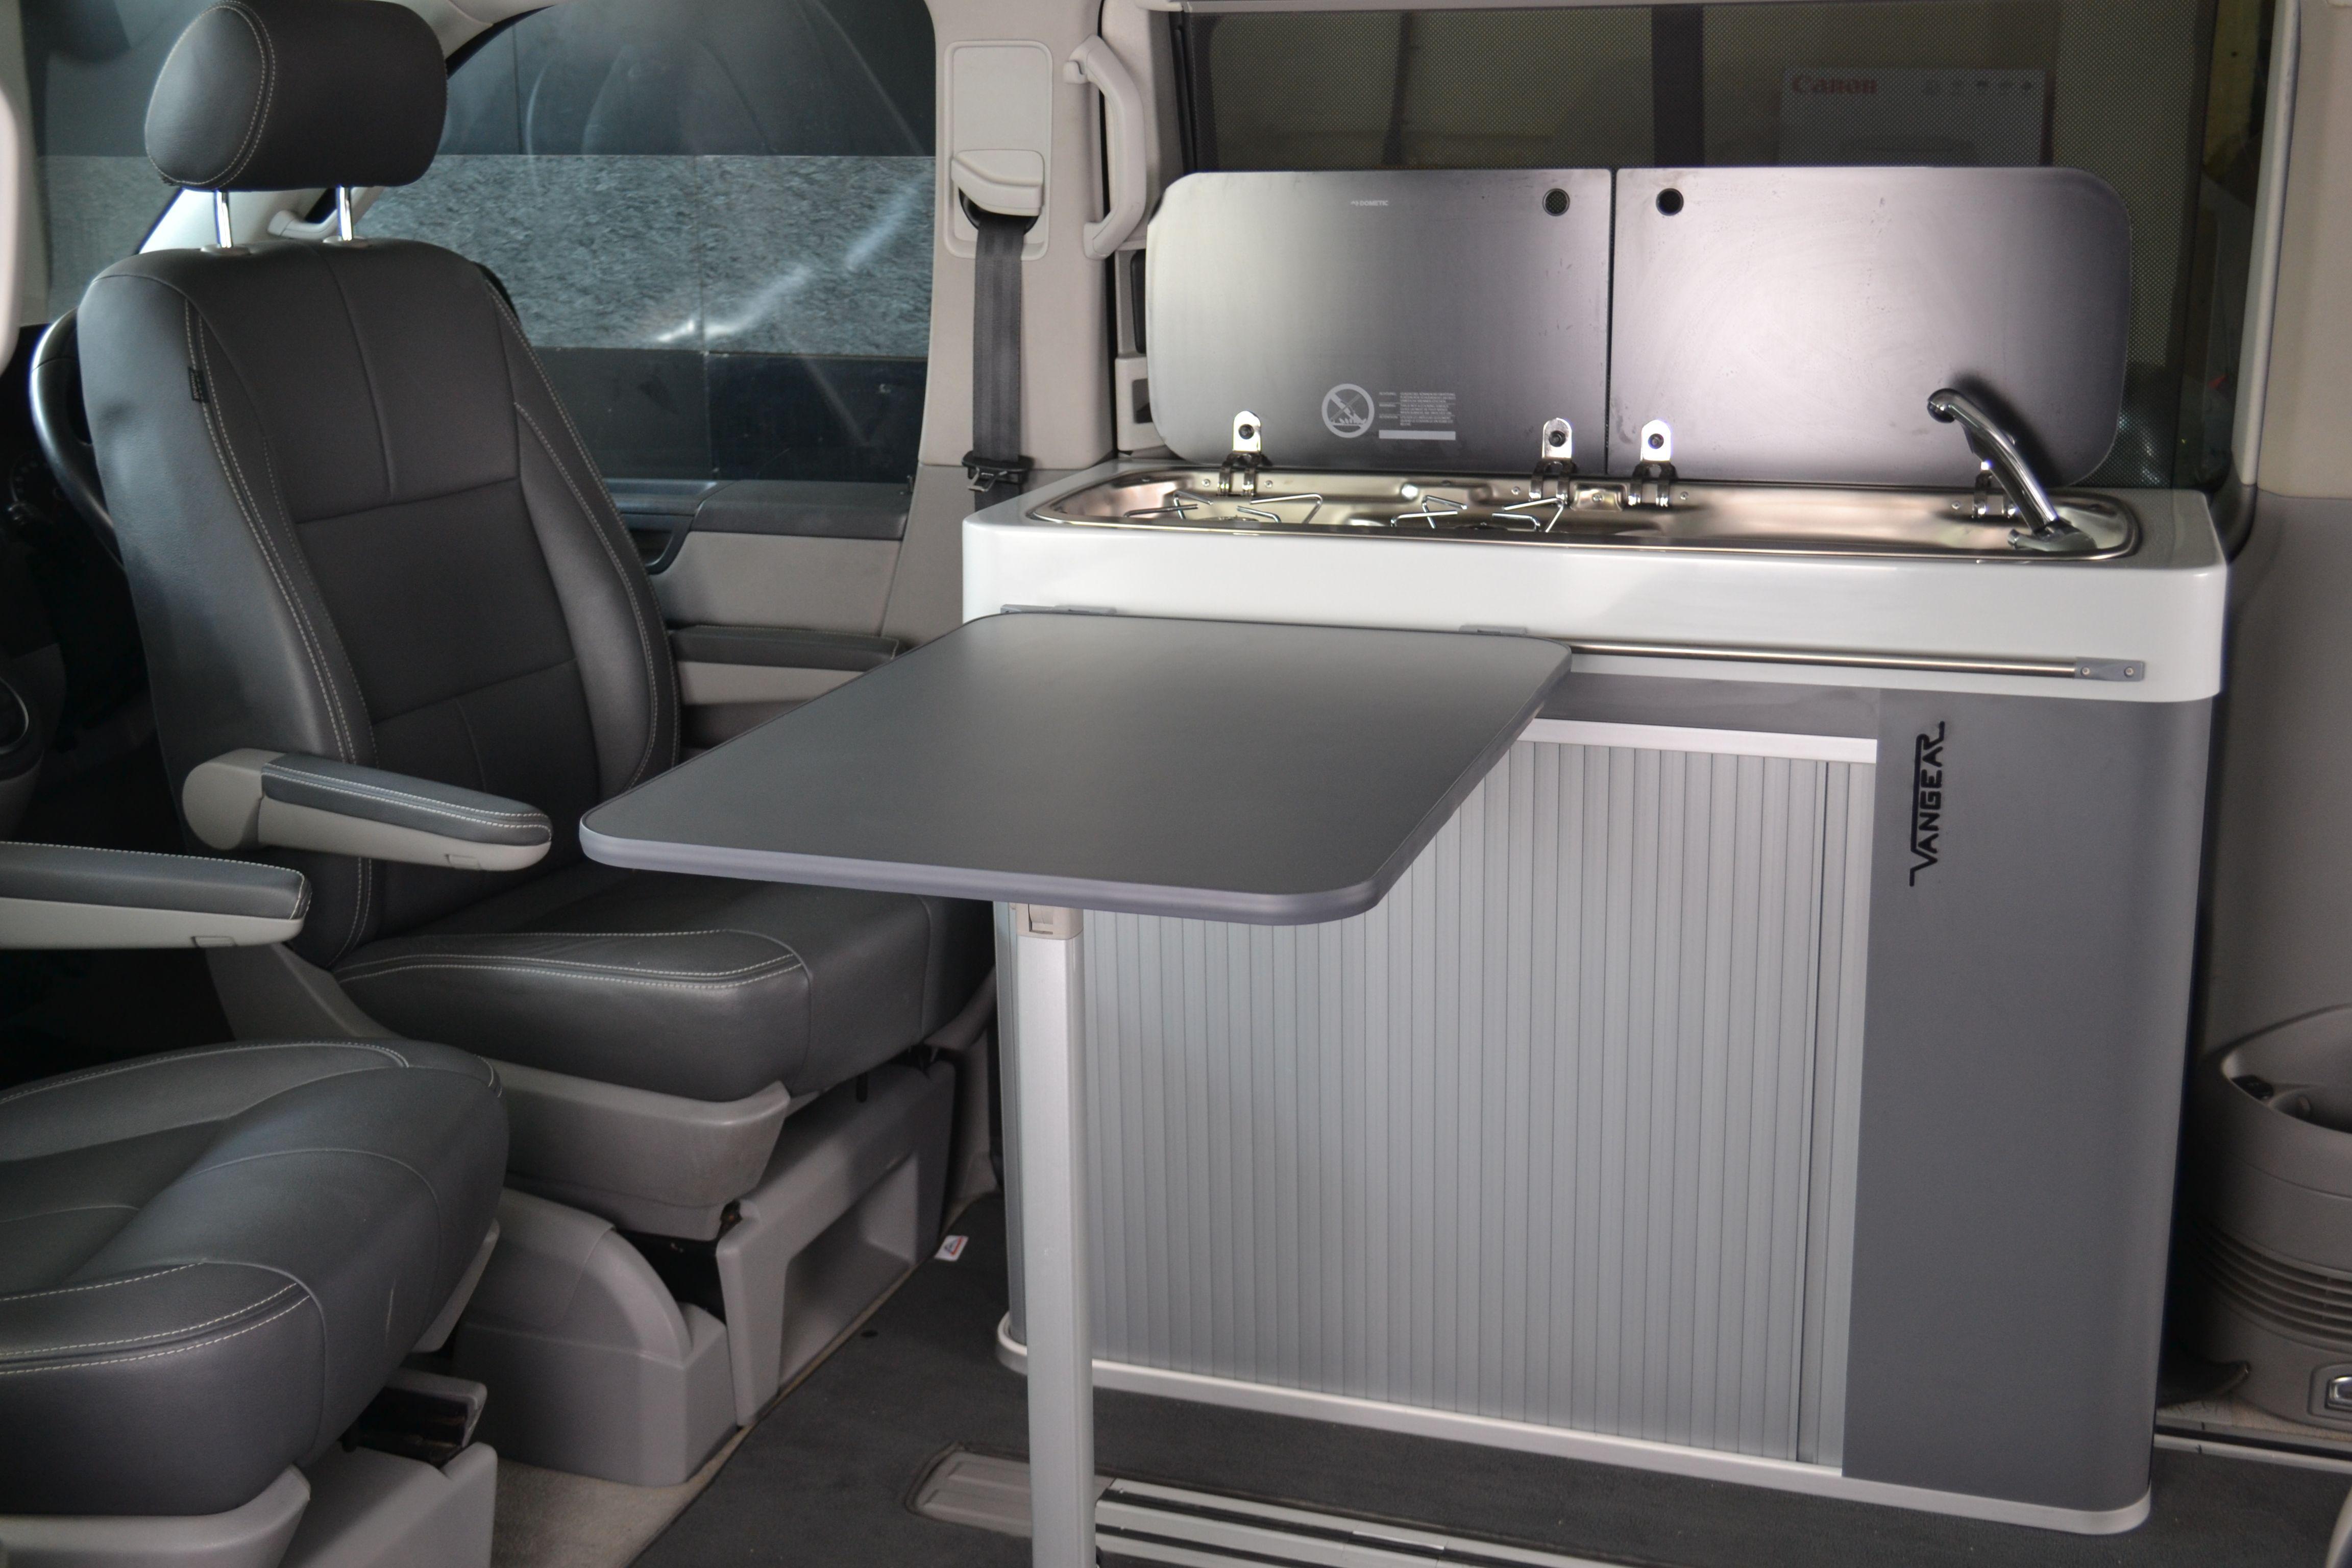 Maxi Campervan Unit | Camper Van | Camper storage, Campervan